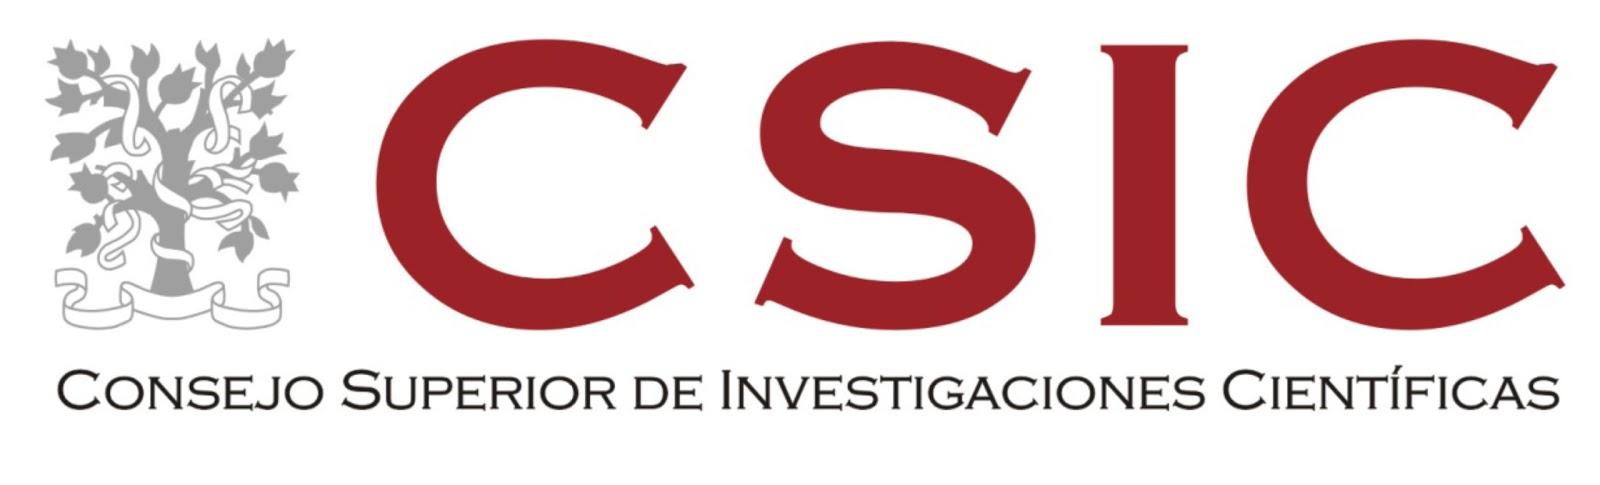 http://1.bp.blogspot.com/-Da0zRHxNyqU/TiPXuRdv9FI/AAAAAAAAGVA/0Ta1tbdcNt0/s1600/CSIC_logo.jpg